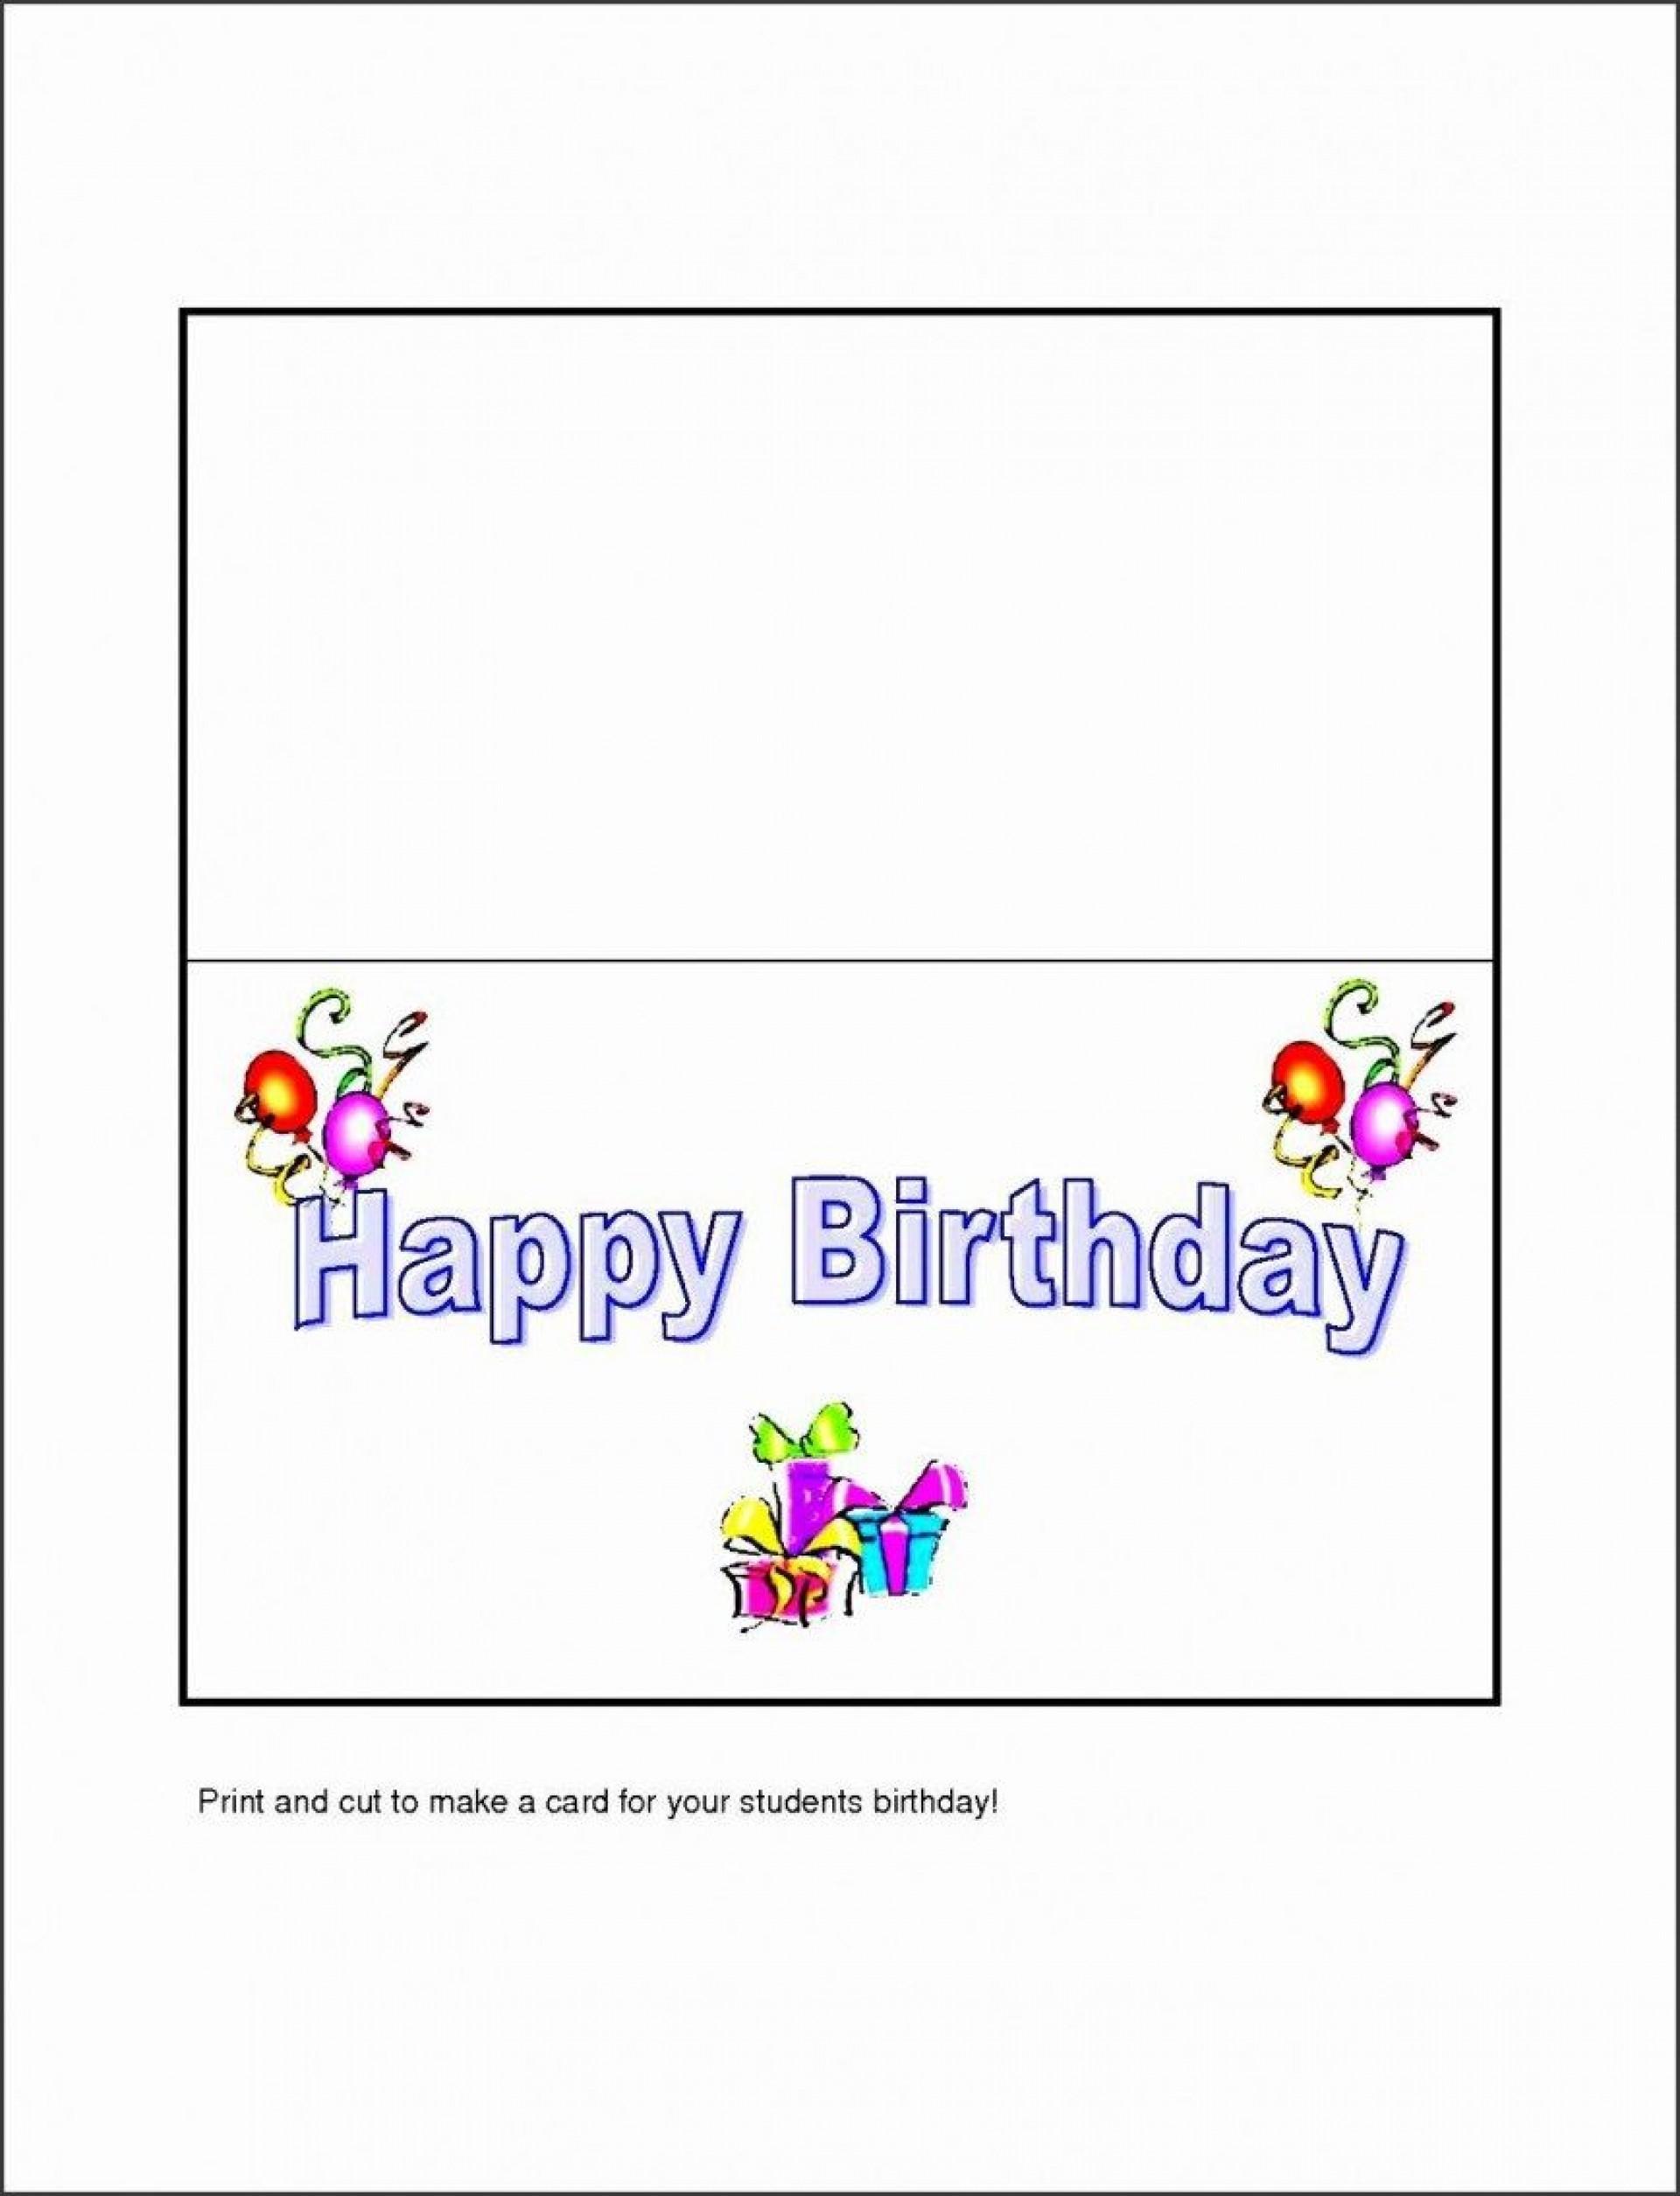 000 Beautiful Printable Greeting Card Template Design  Templates Print Free Birthday1920